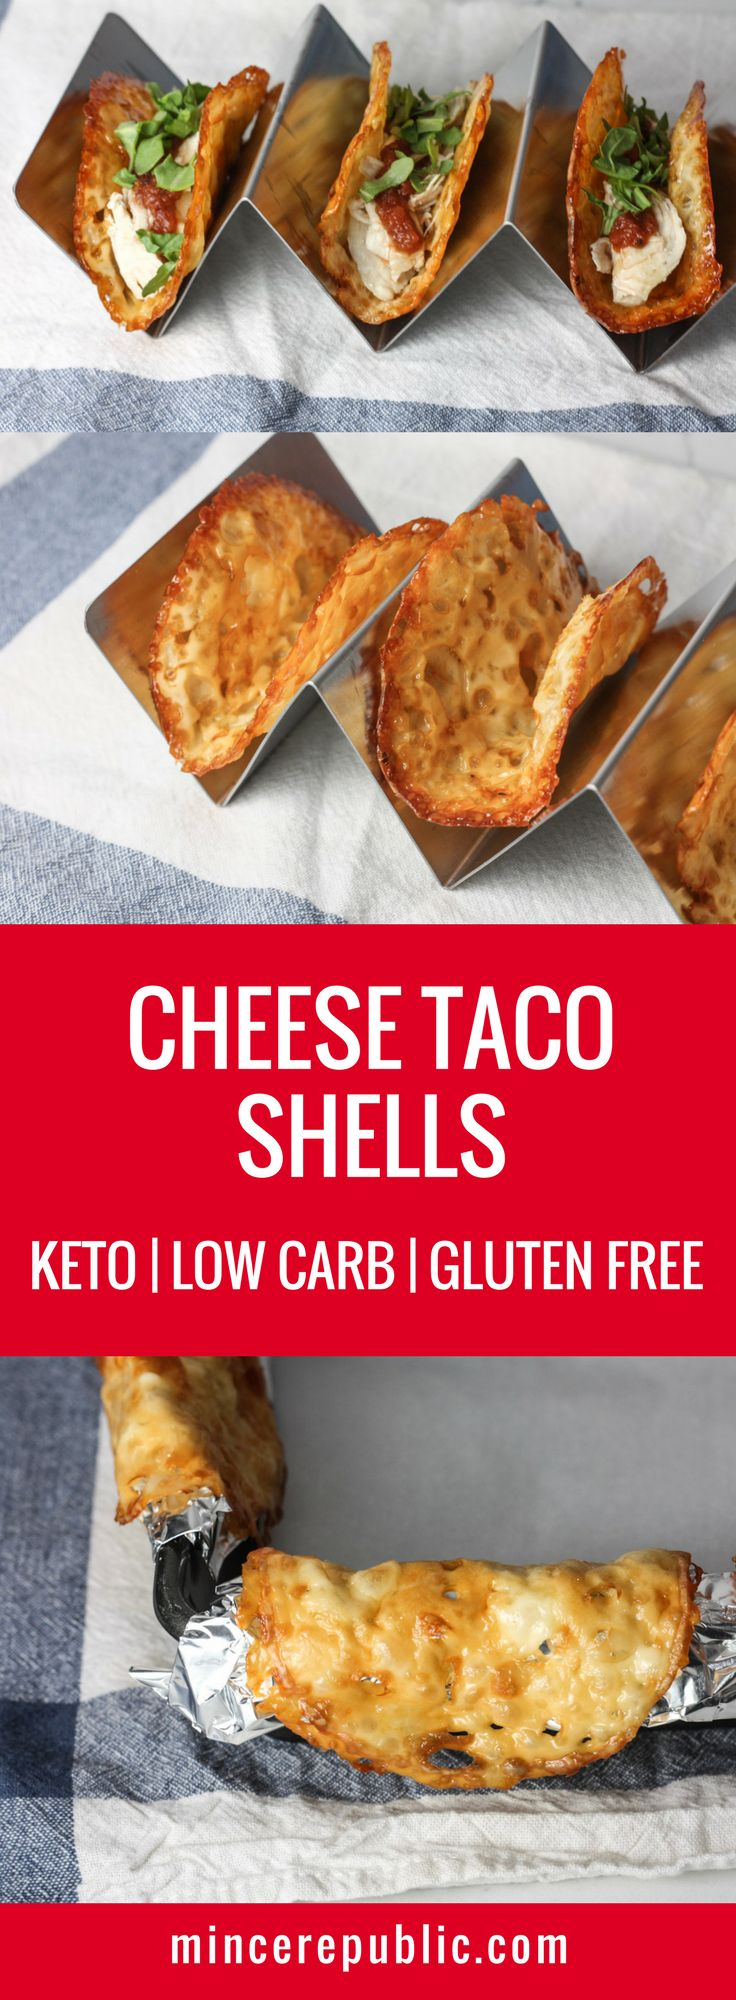 Cheese Taco Shells recipe   Keto Low Carb Gluten Free   mincerepublic.com